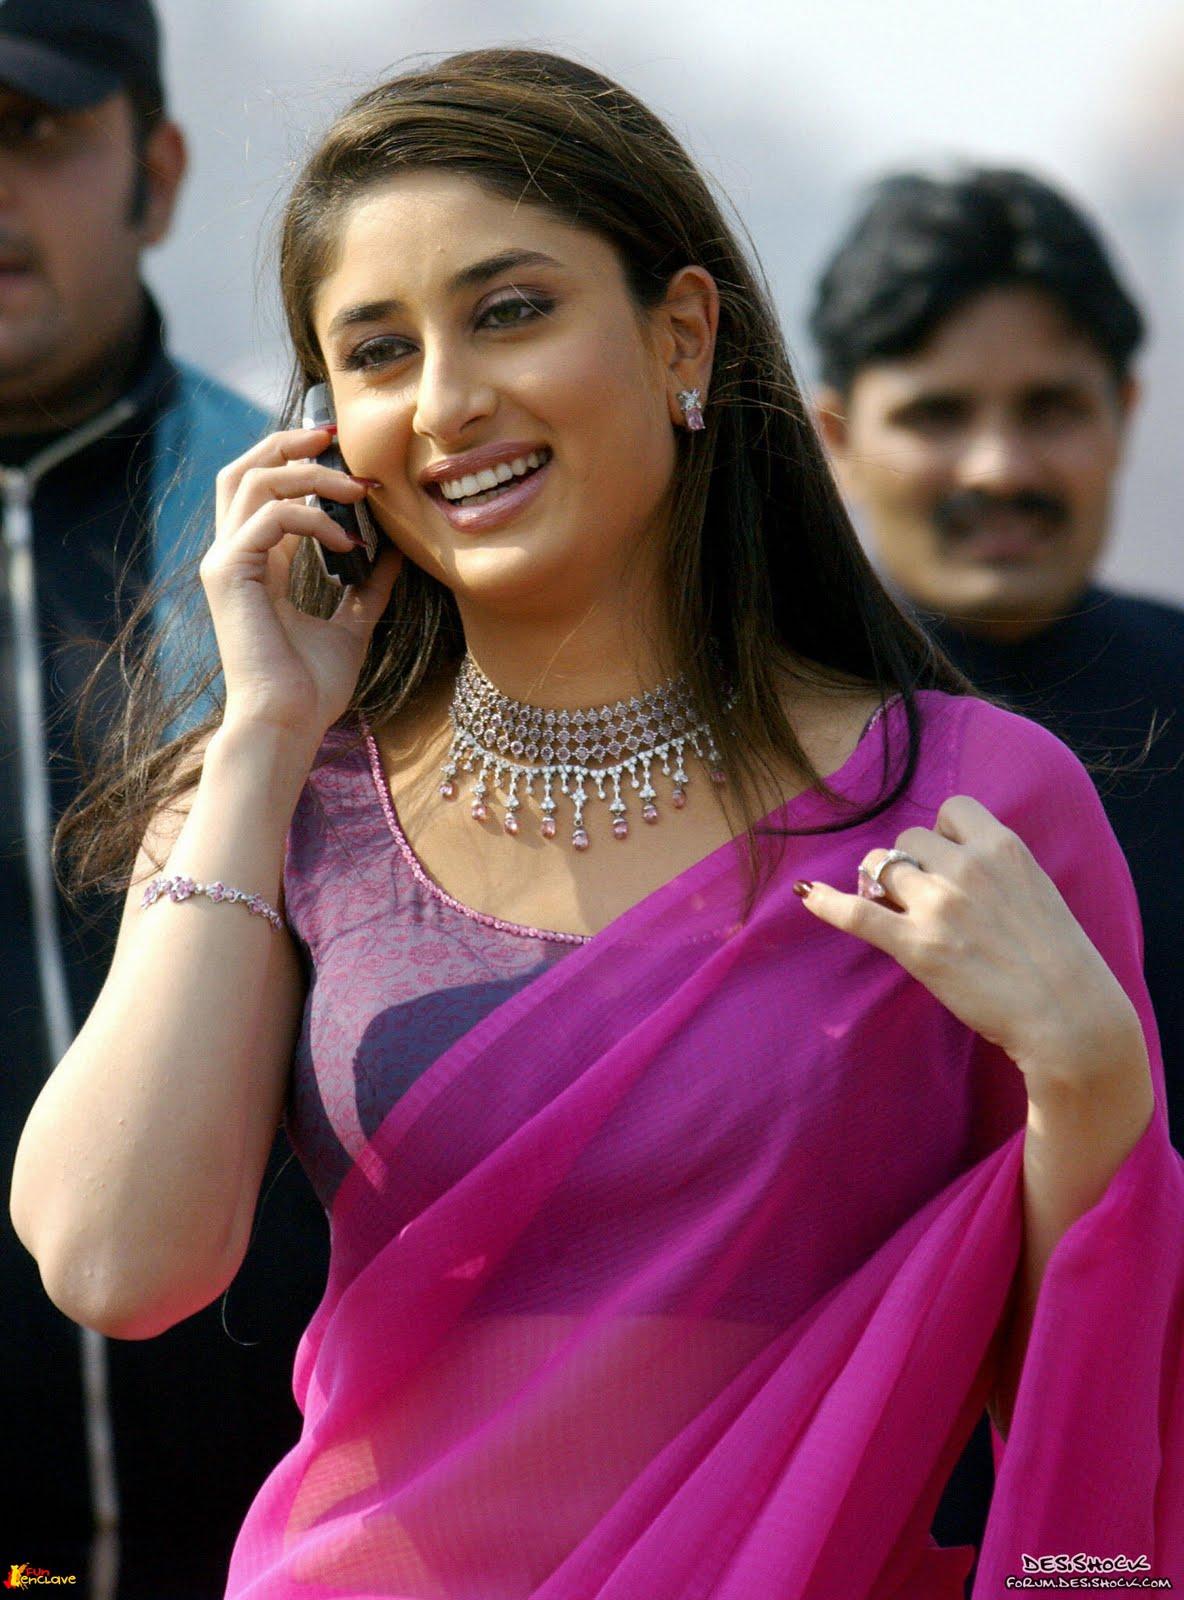 http://1.bp.blogspot.com/-0dIzVMZ46kA/TmY2dz6l_dI/AAAAAAAAAe8/yOn-FZTHyQo/s1600/Kareena+Kapoor+Smiling+and+Talking+on+Mobile.jpg